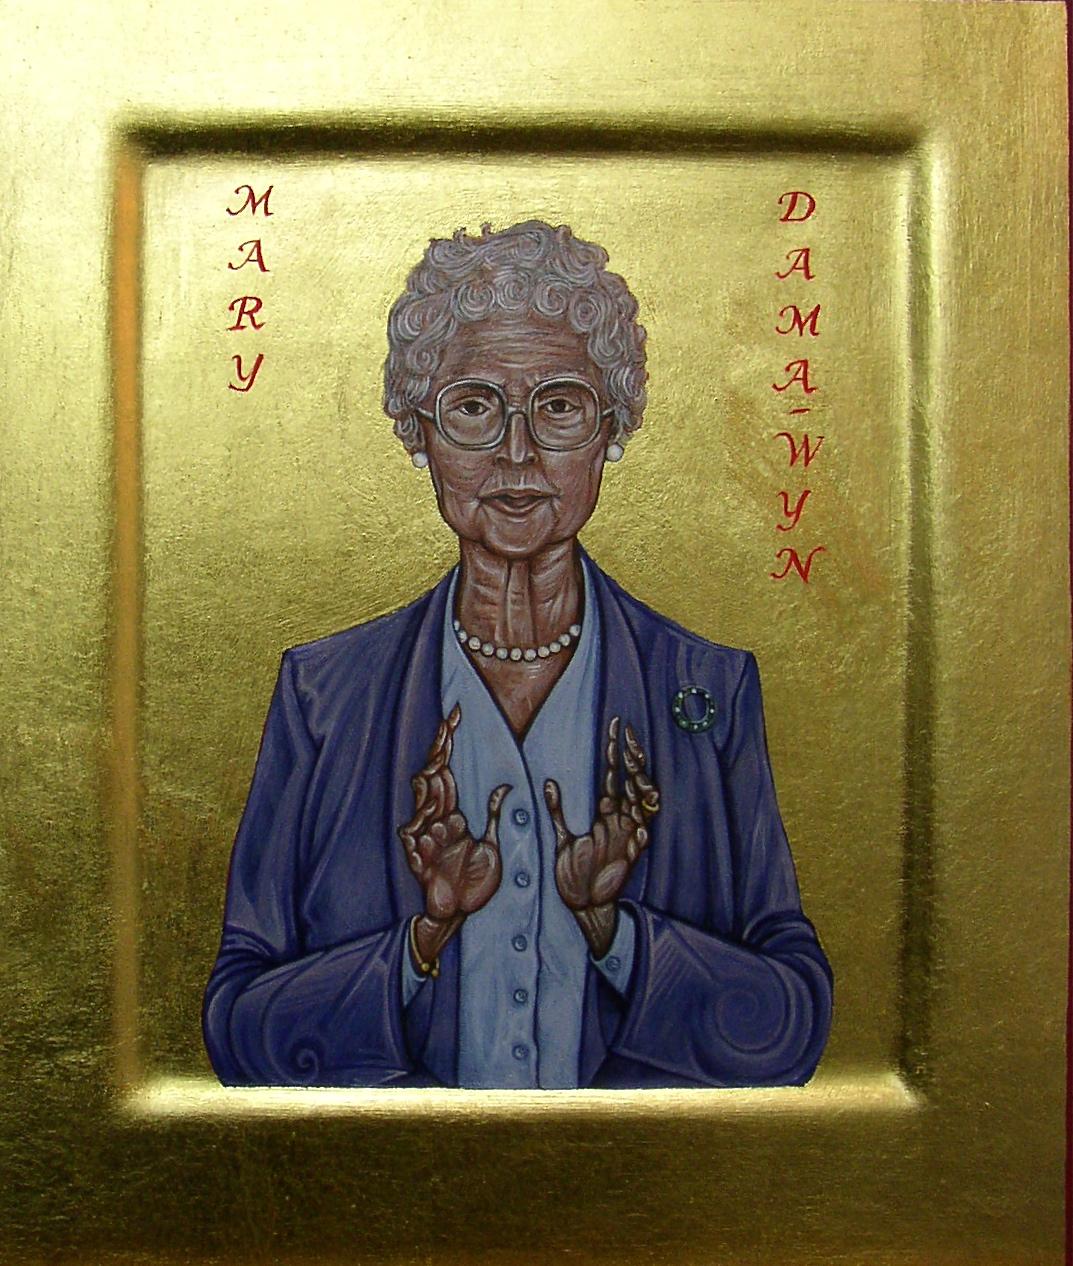 Regan O'Callaghan Dama wyn, religious icon, egg tempera, sainthood of all believers, cornish